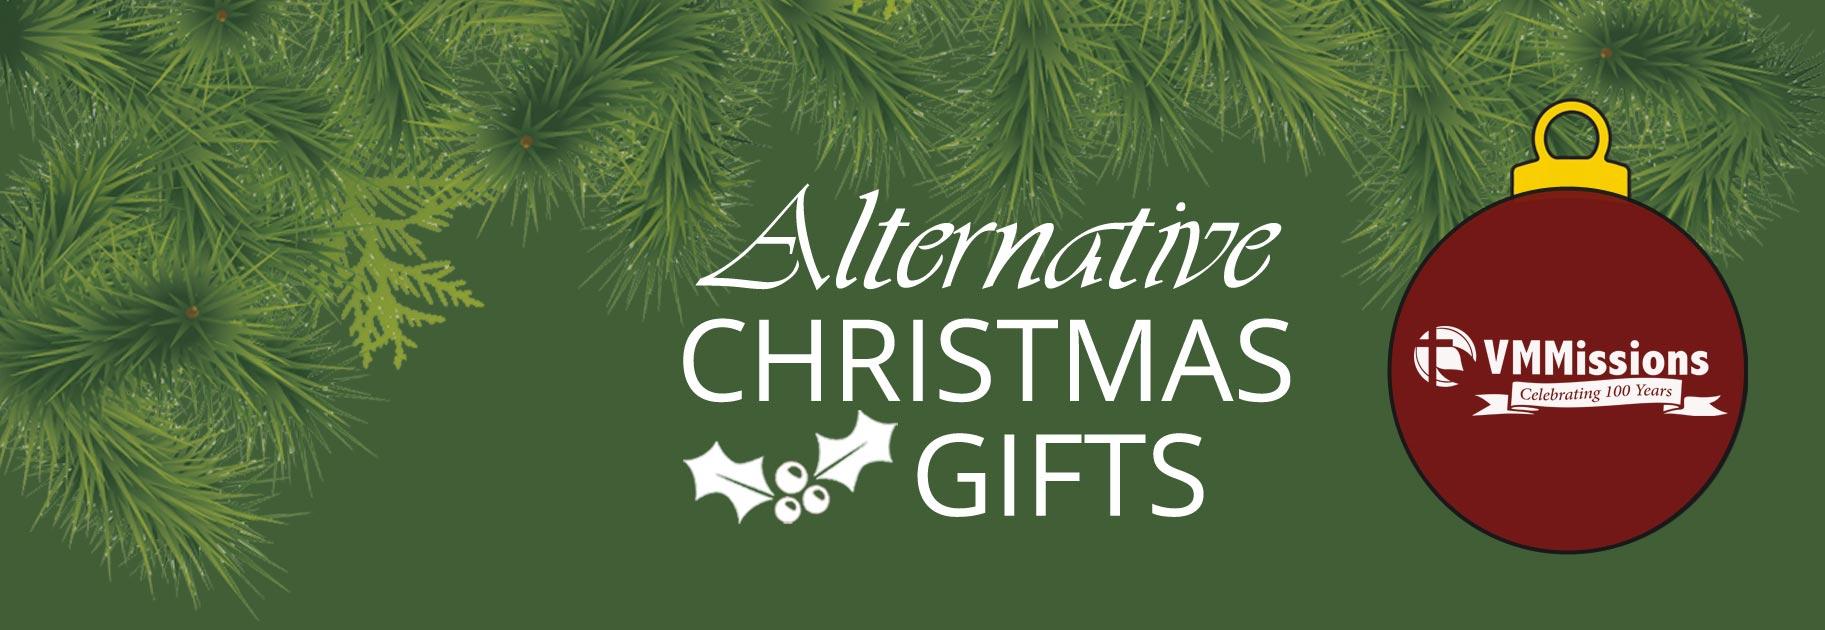 Alternative Christmas Gifts